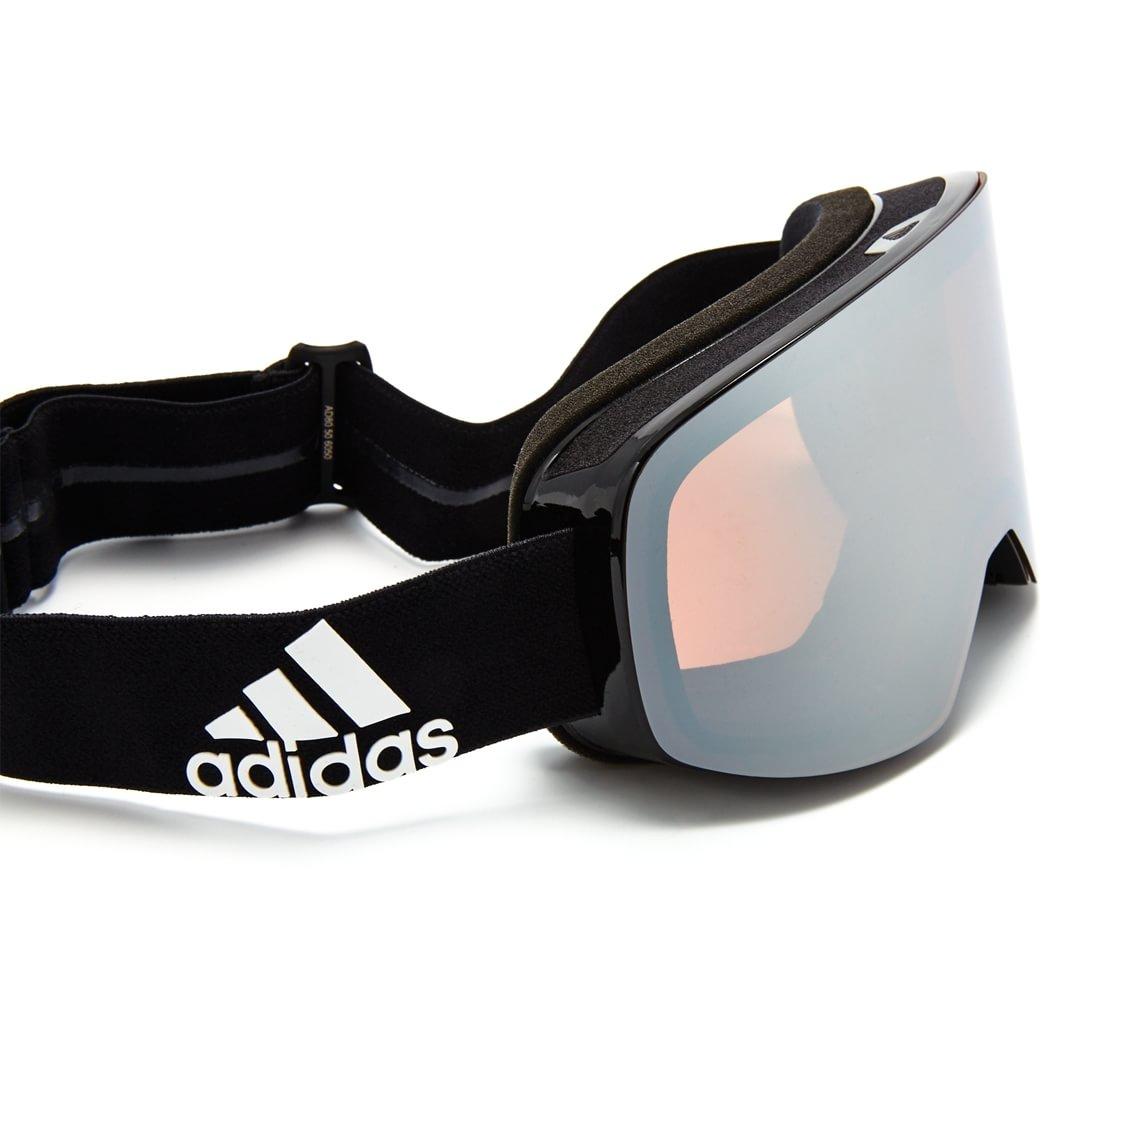 Adidas Blackland Ad80 50 6050